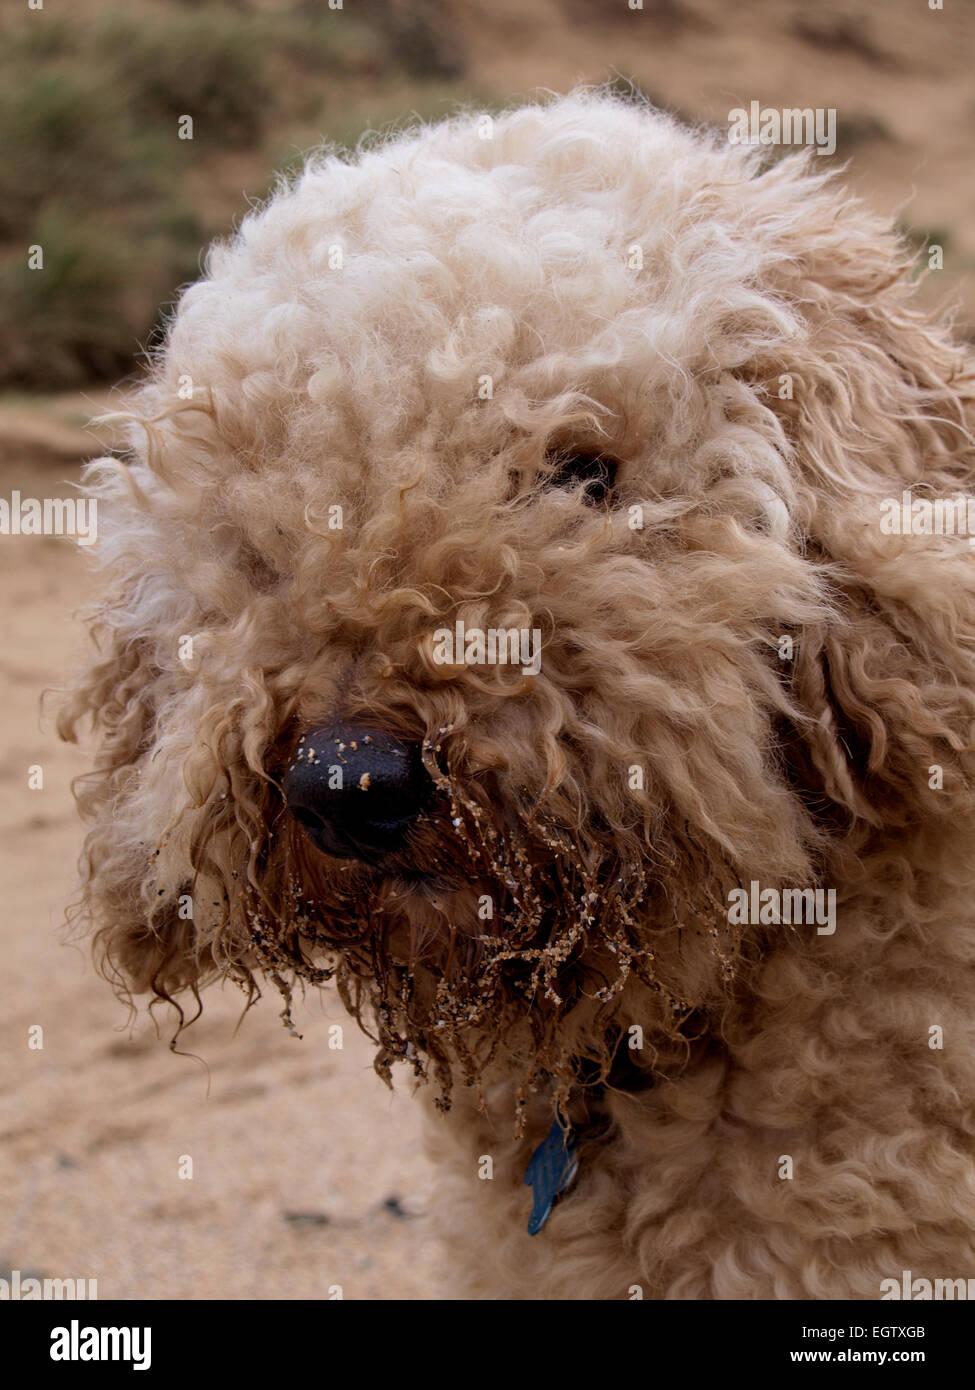 Fluffy dog with sandy beard looking at camera, UK - Stock Image